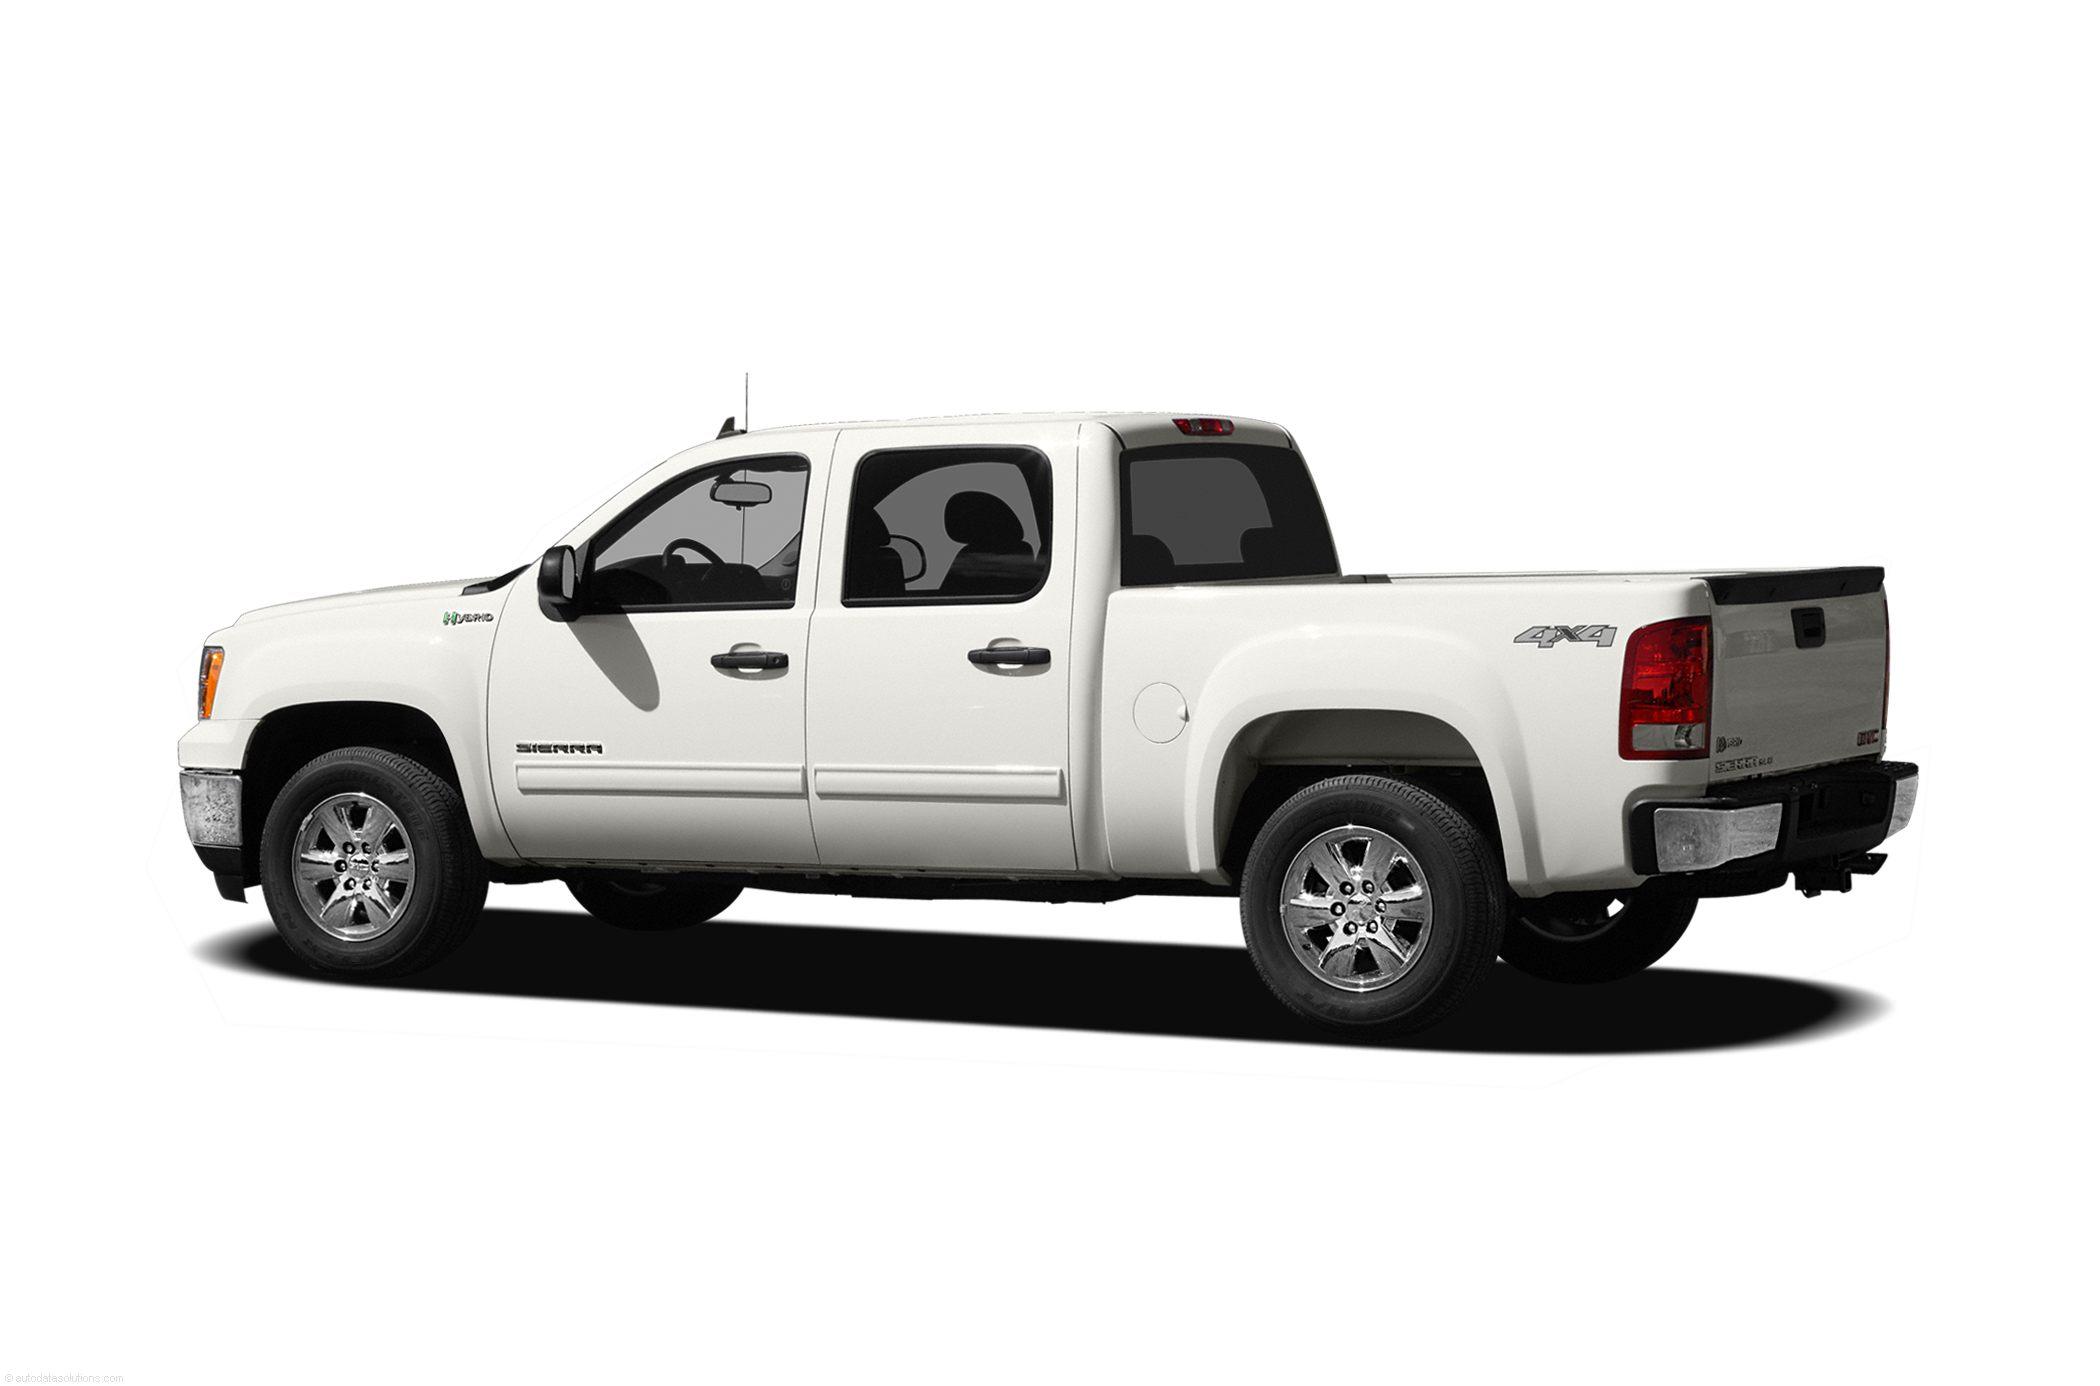 Regular Cab Gmc >> 2011 GMC SIERRA 1500 HYBRID - Image #8